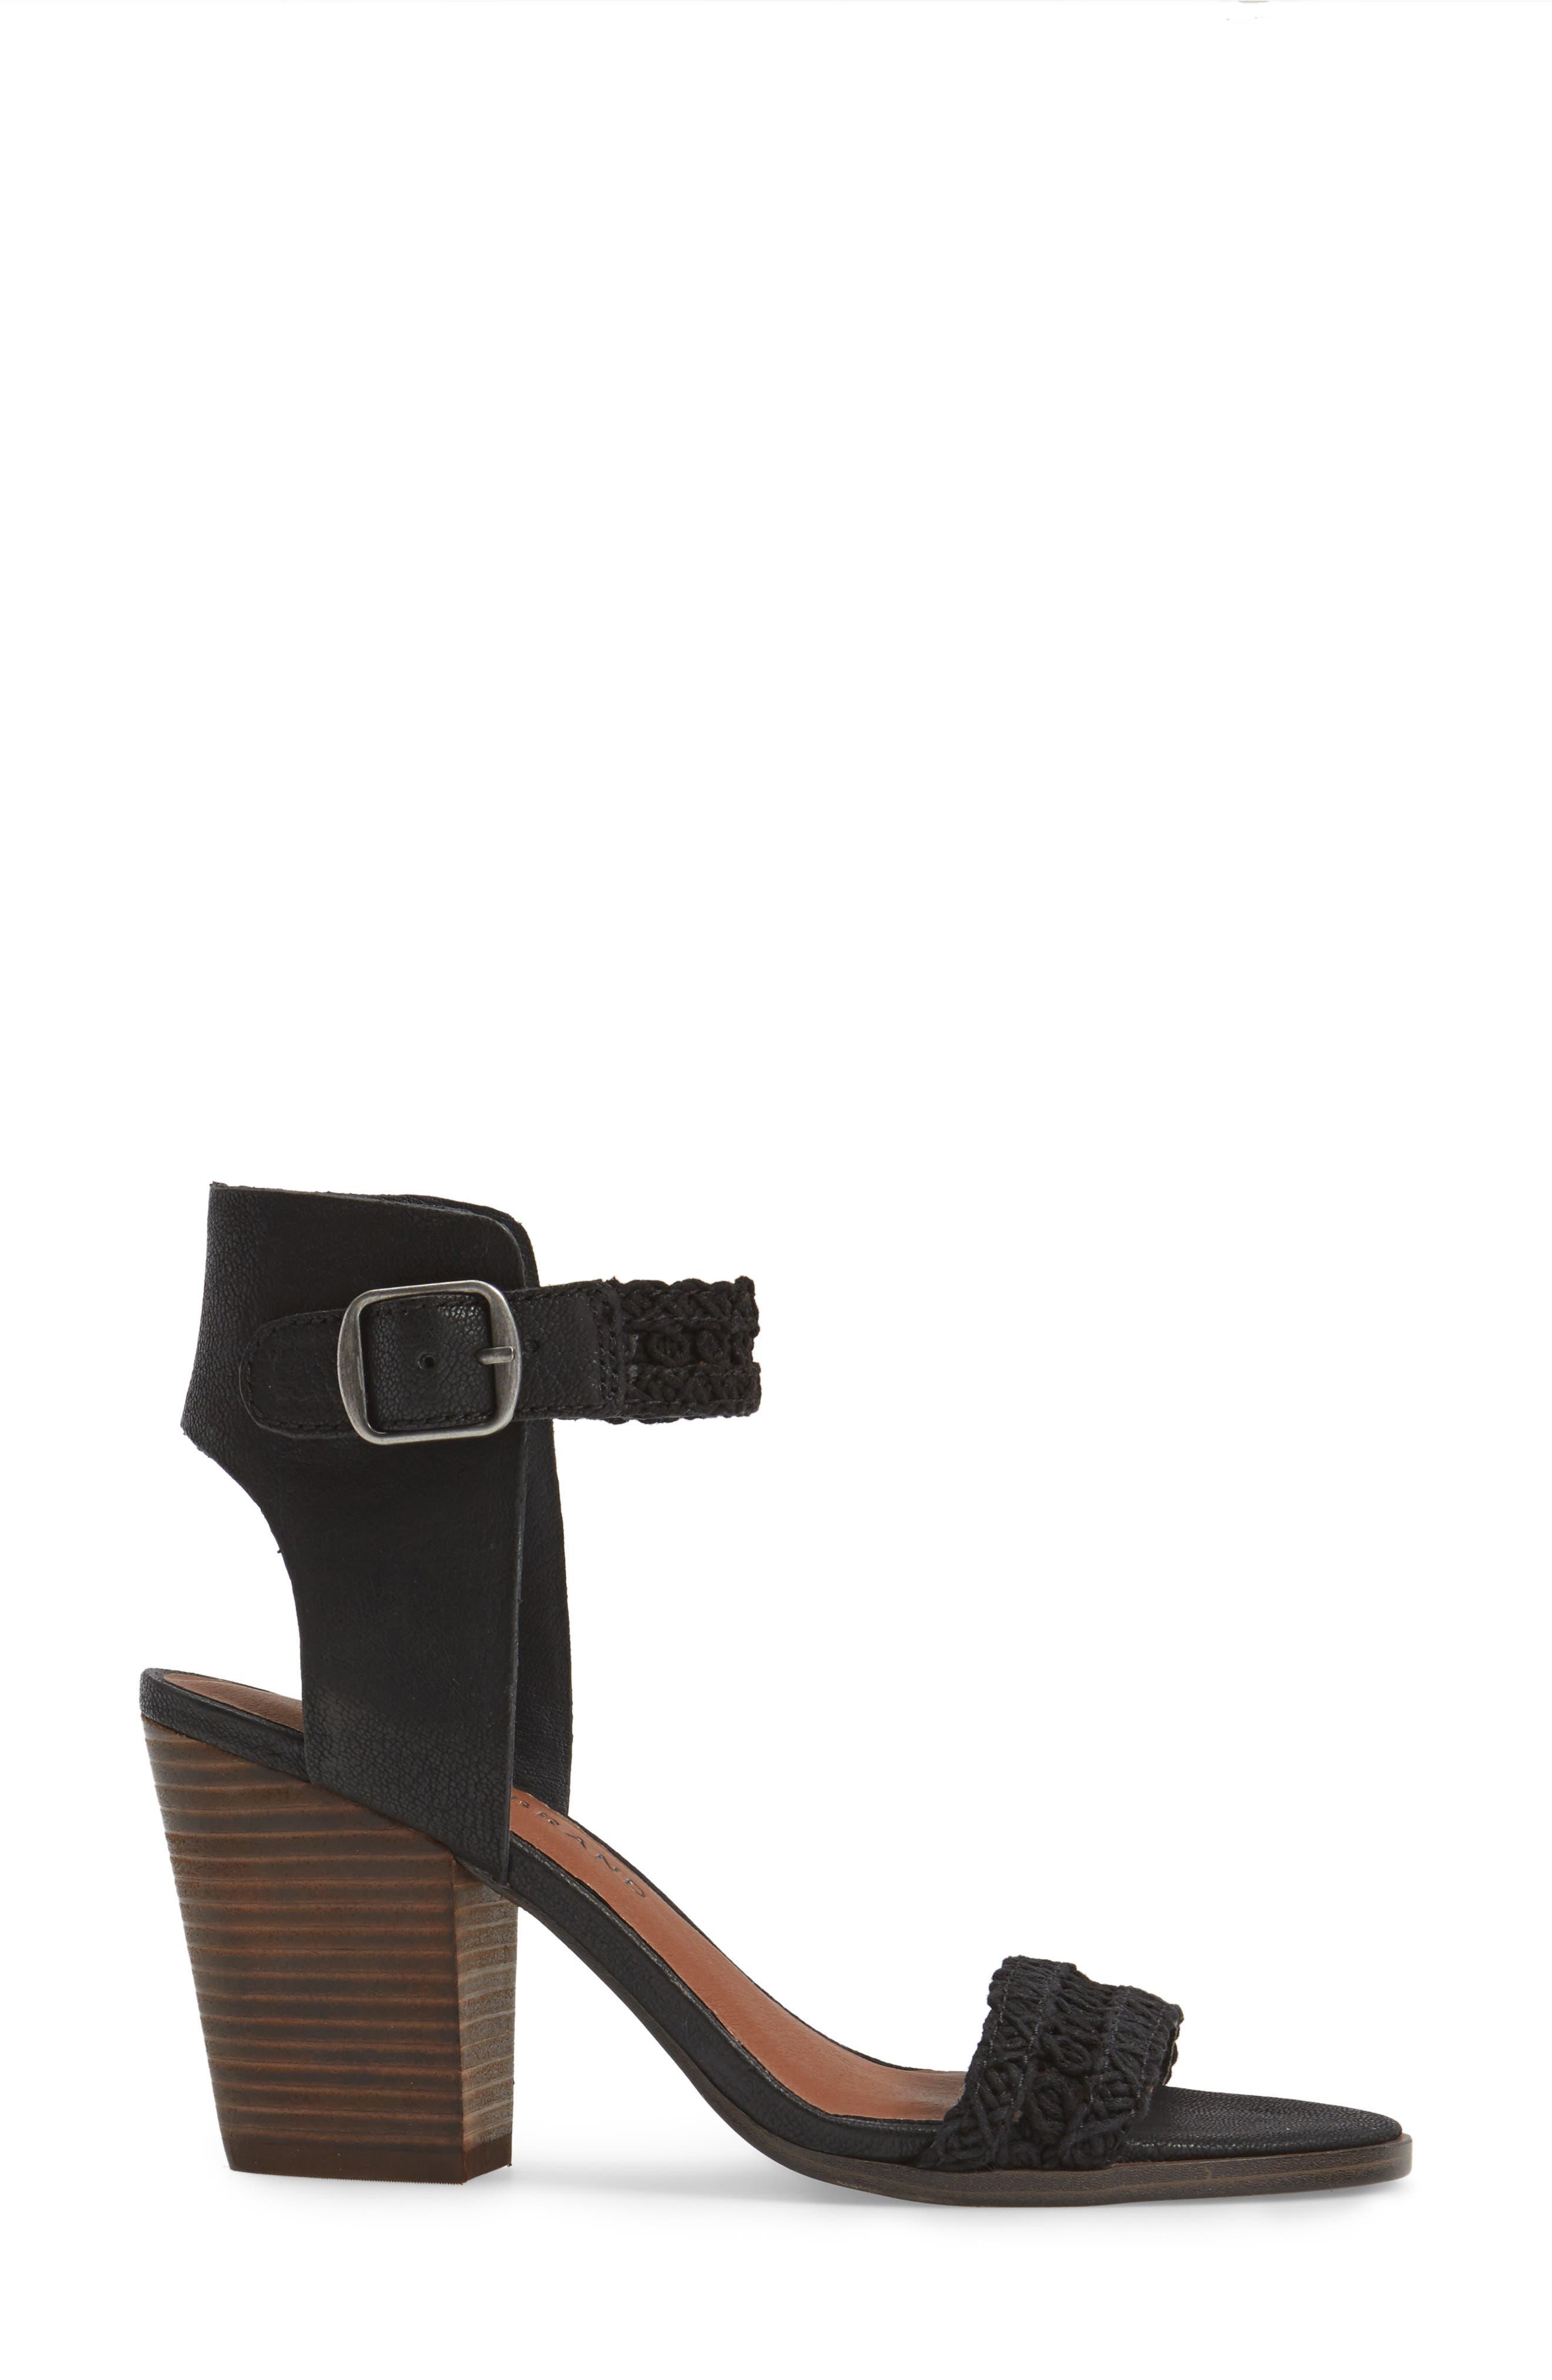 Oakes Ankle Strap Sandal,                             Alternate thumbnail 3, color,                             Black Leather